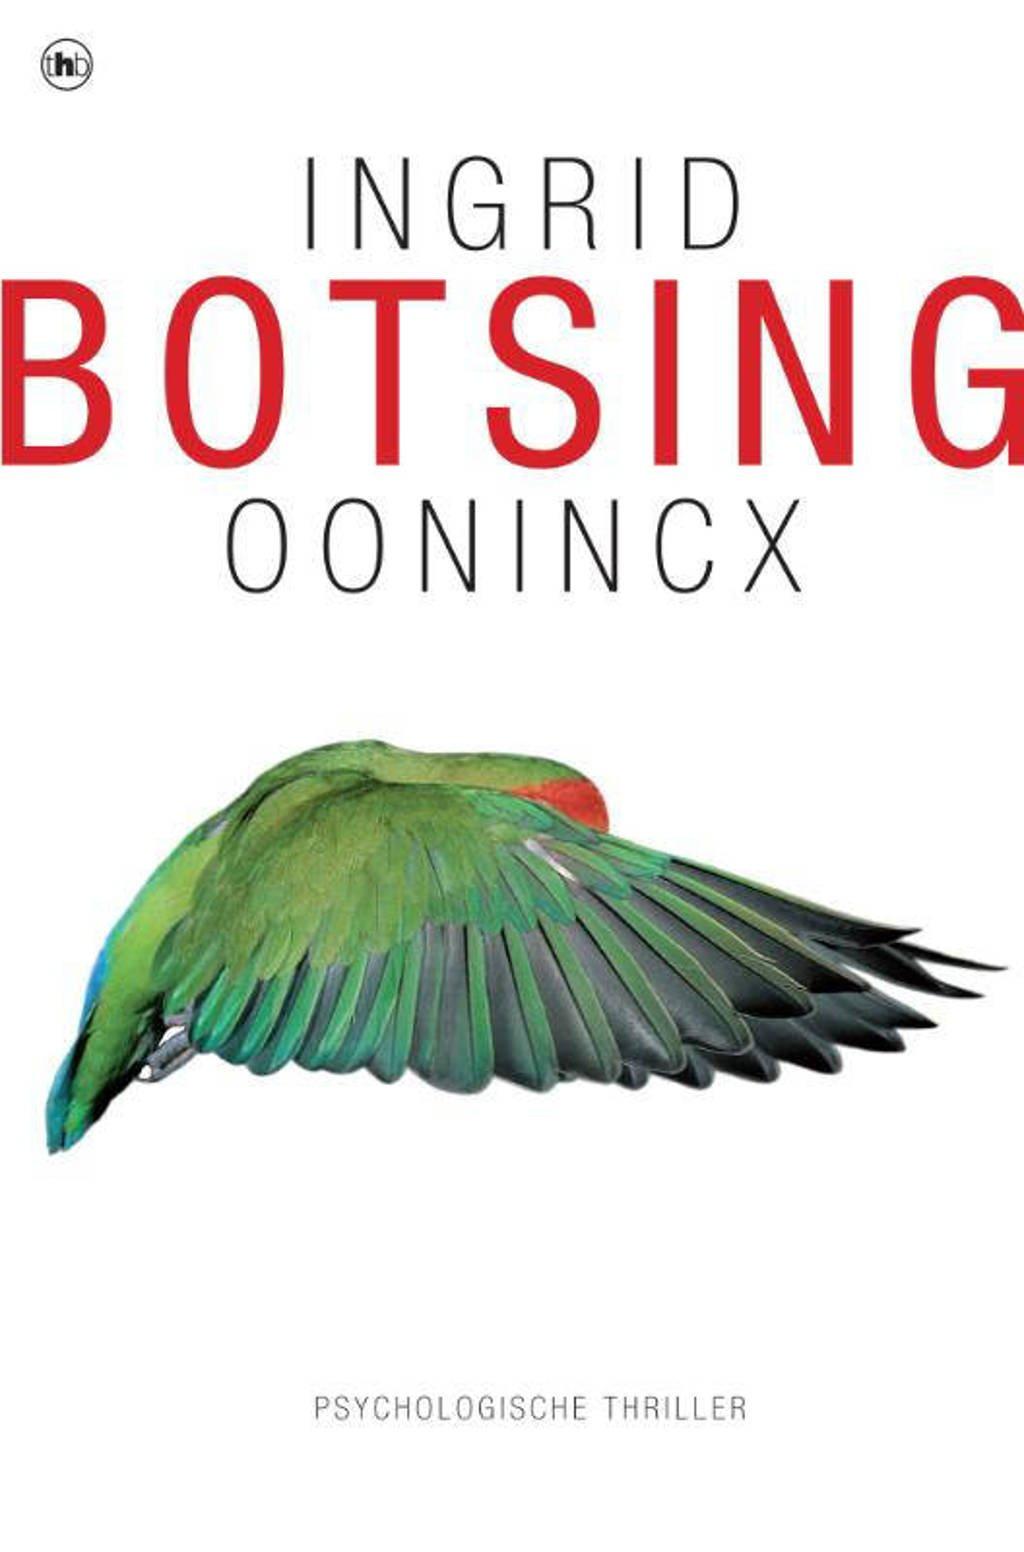 Botsing - Ingrid Oonincx